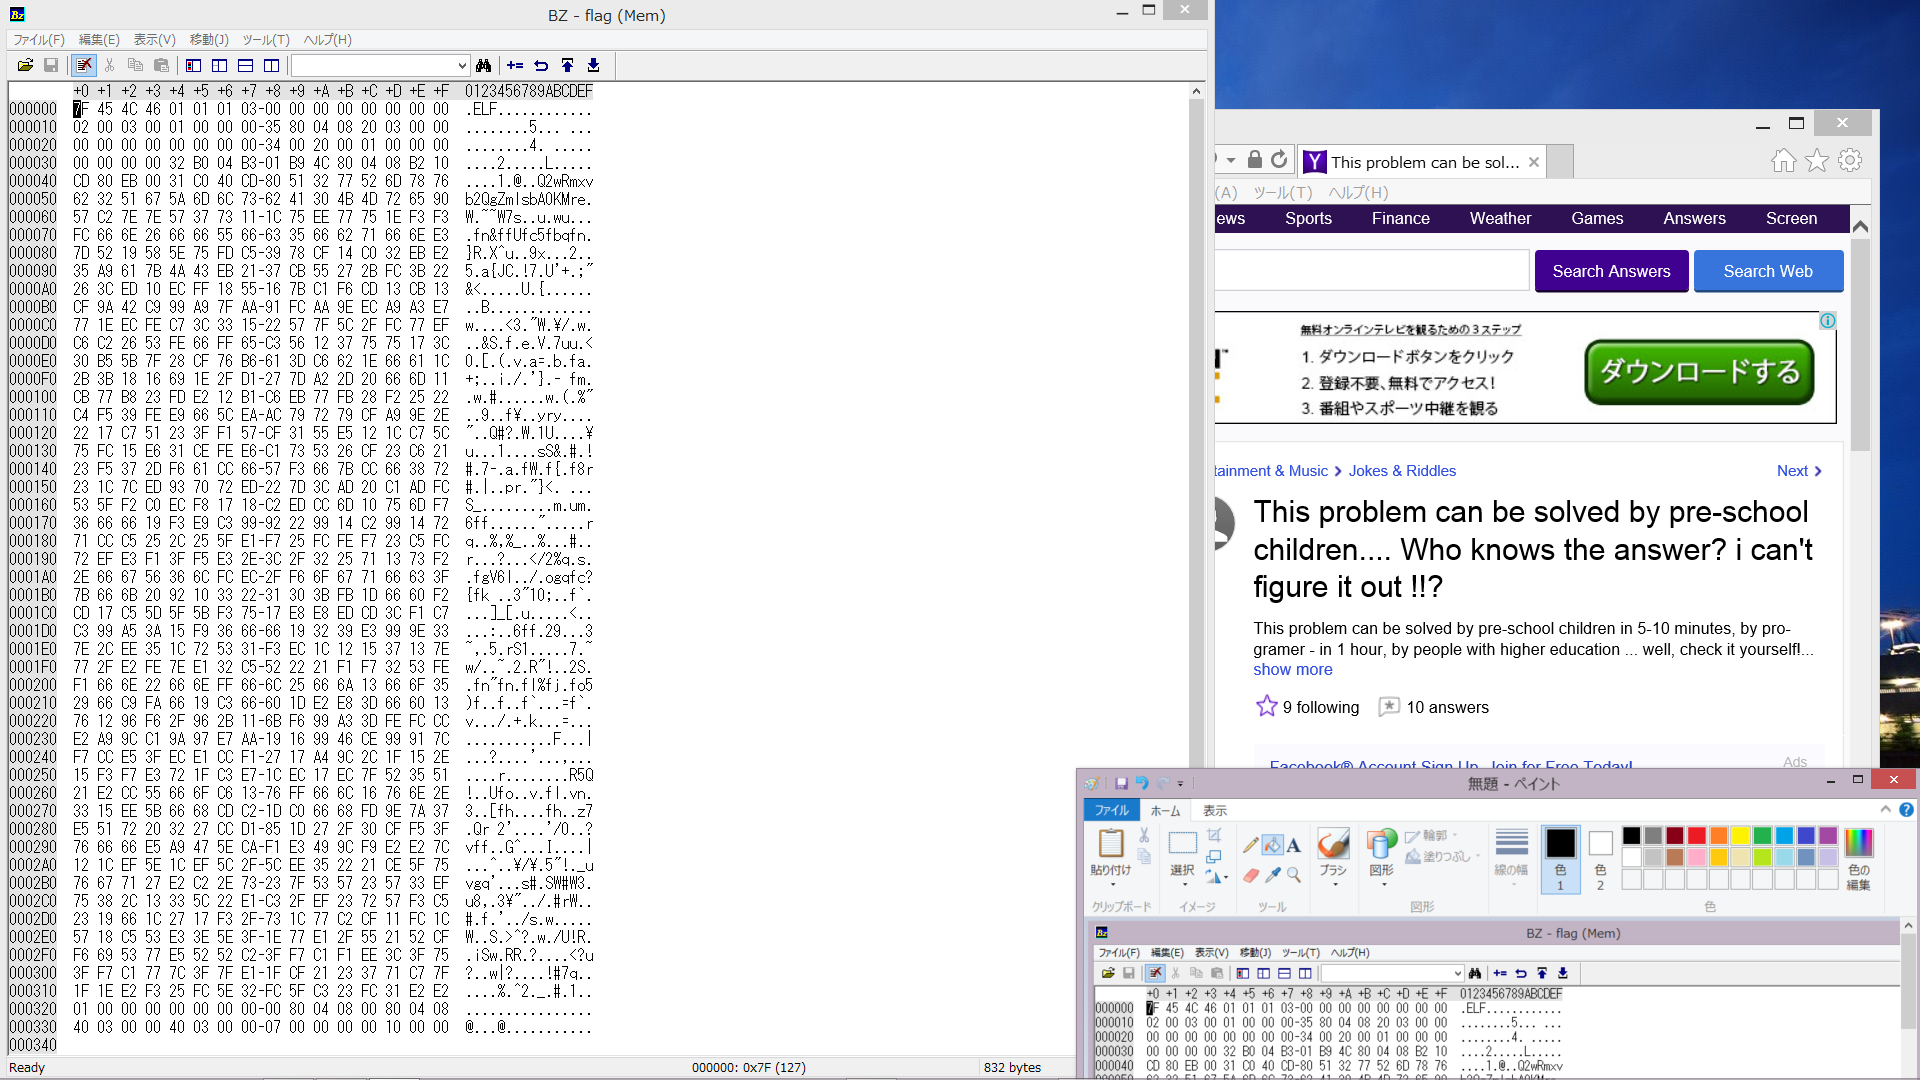 desktop_capture (1).png